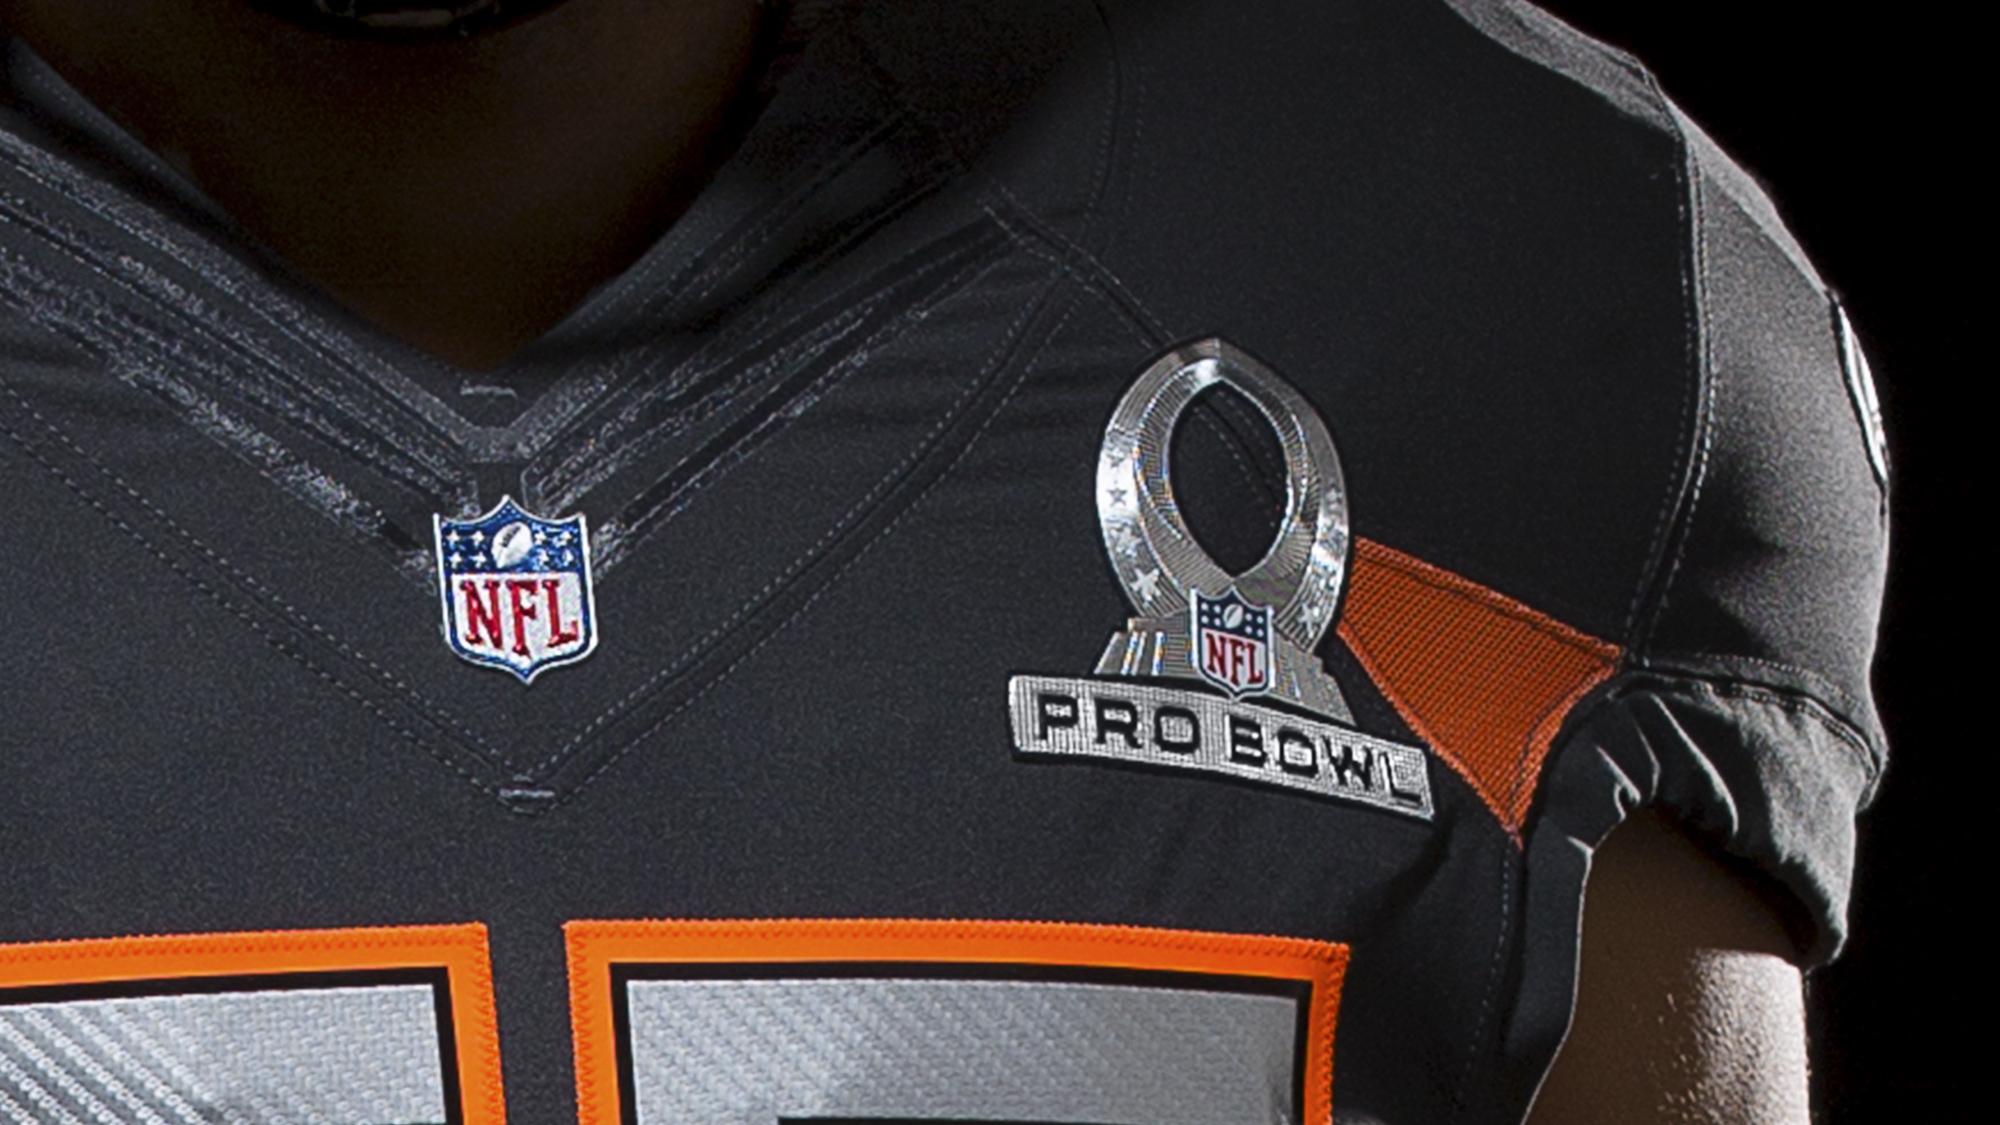 SP14_NFL_SB_TeamUni_Seahawks_4678_PR_crop_1_2_original.jpg